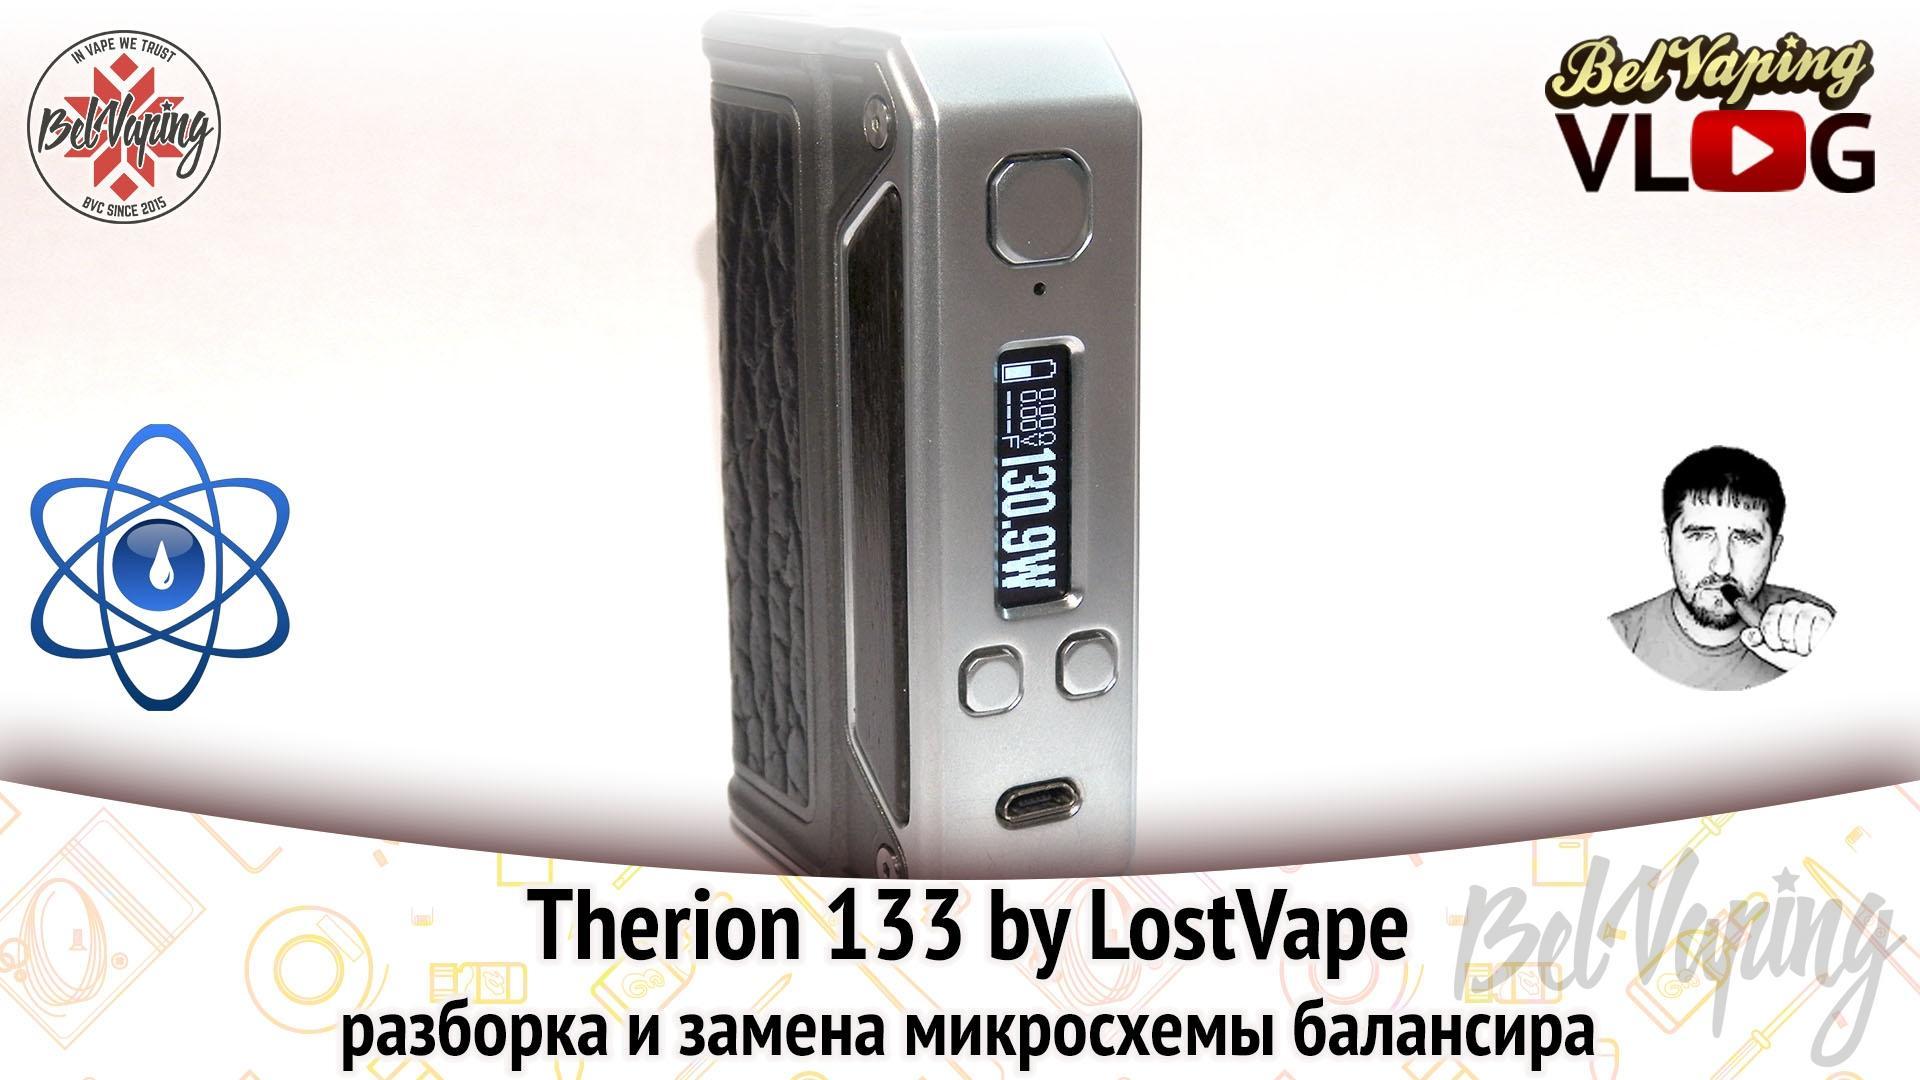 Ремонт Therion 133 на DNA200 от LostVape